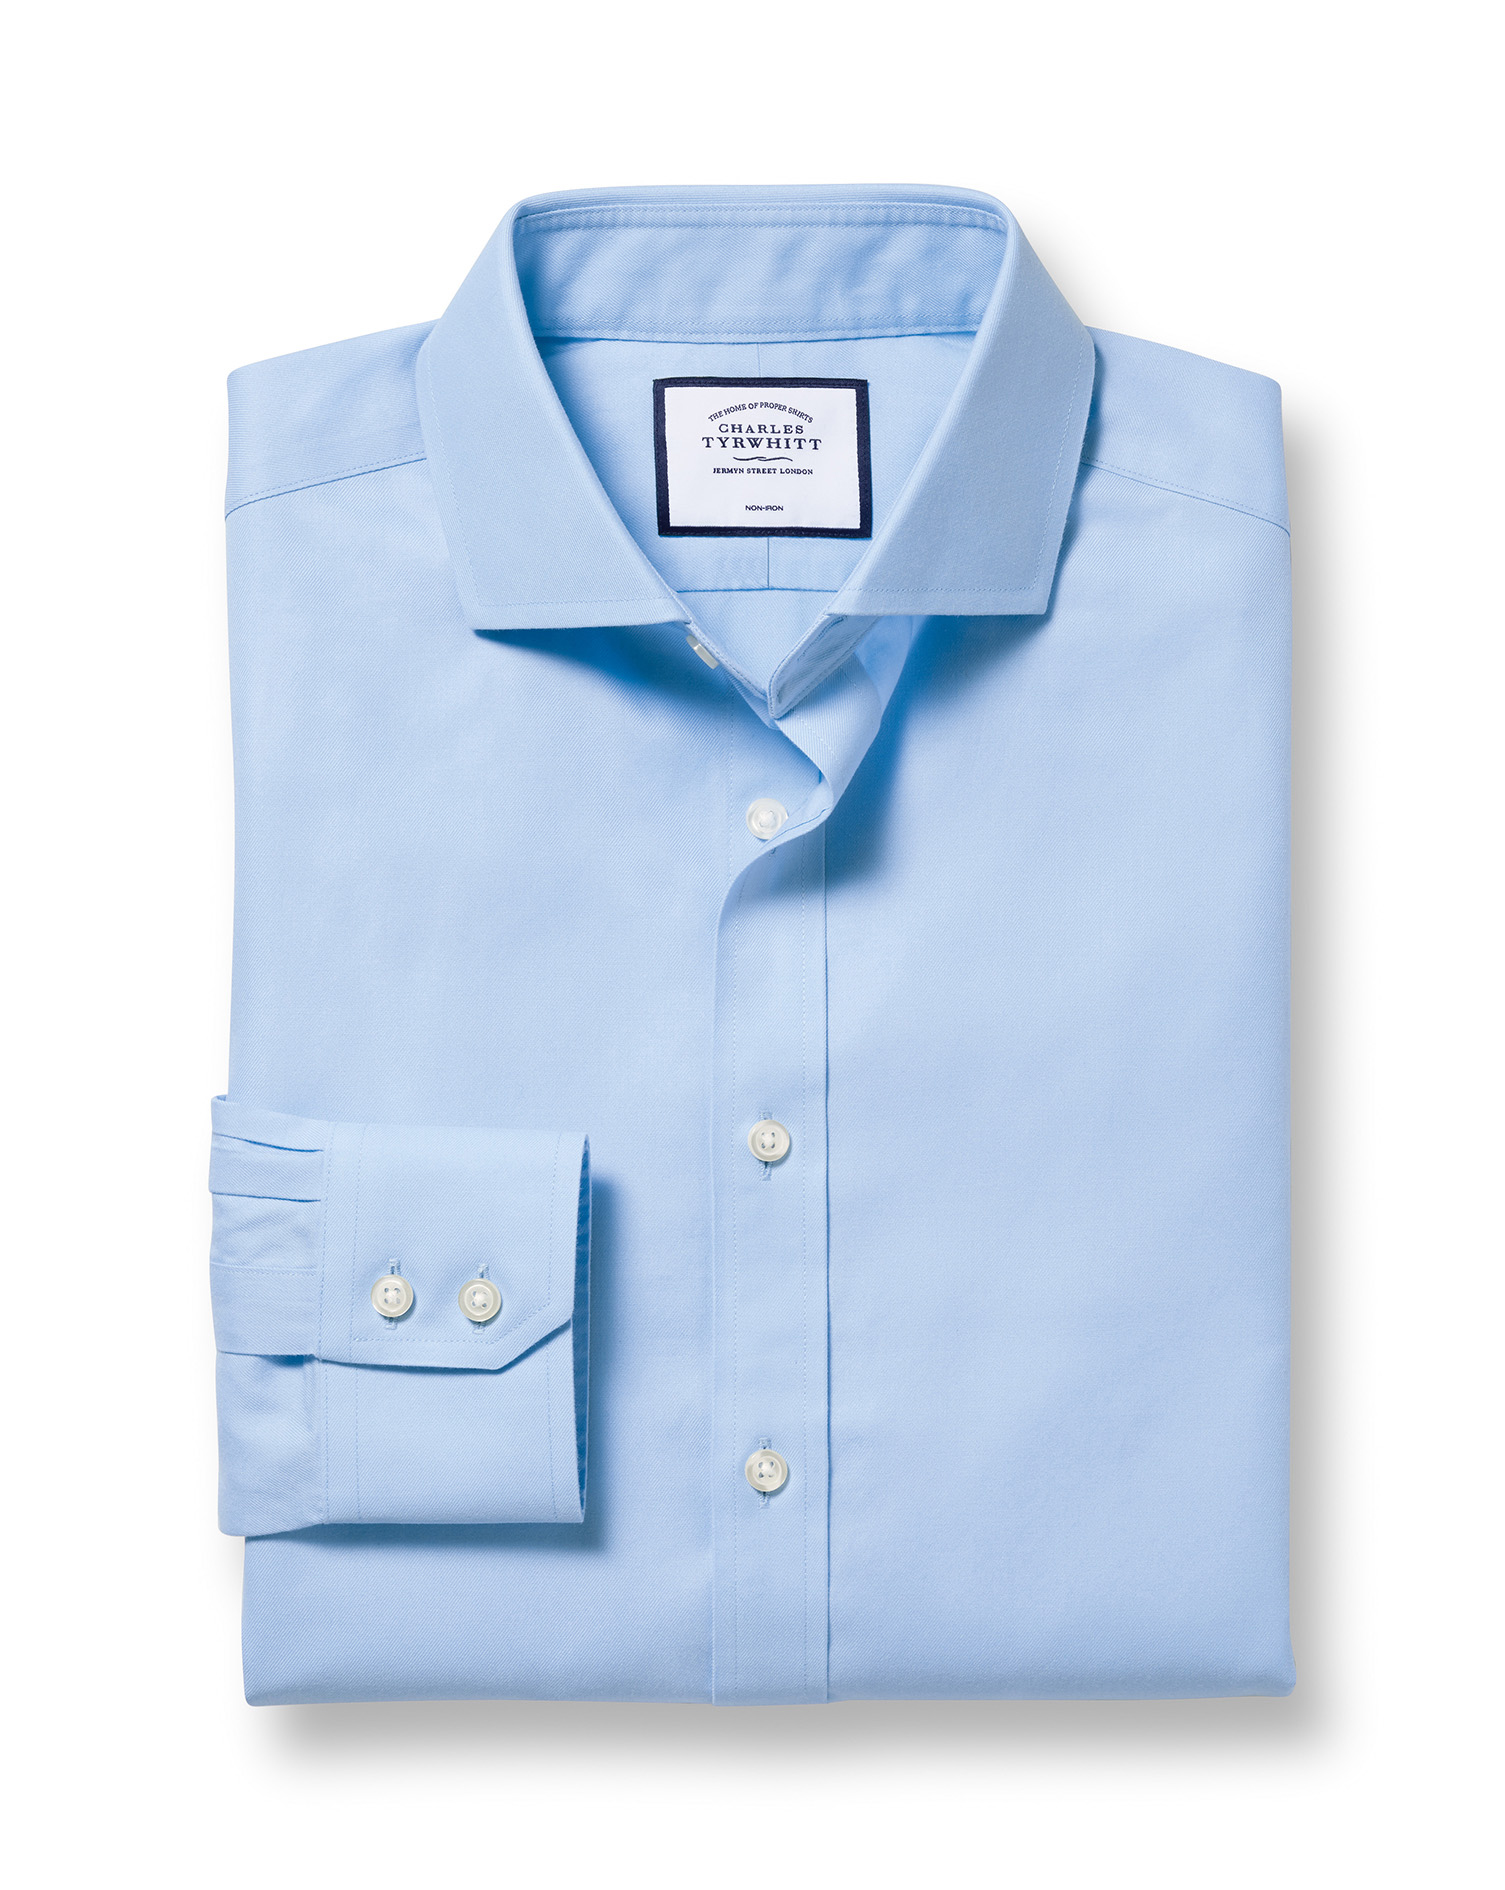 Extra Slim Fit Sky Blue Non-Iron Twill Cutaway Collar Cotton Formal Shirt Single Cuff Size 17.5/34 b